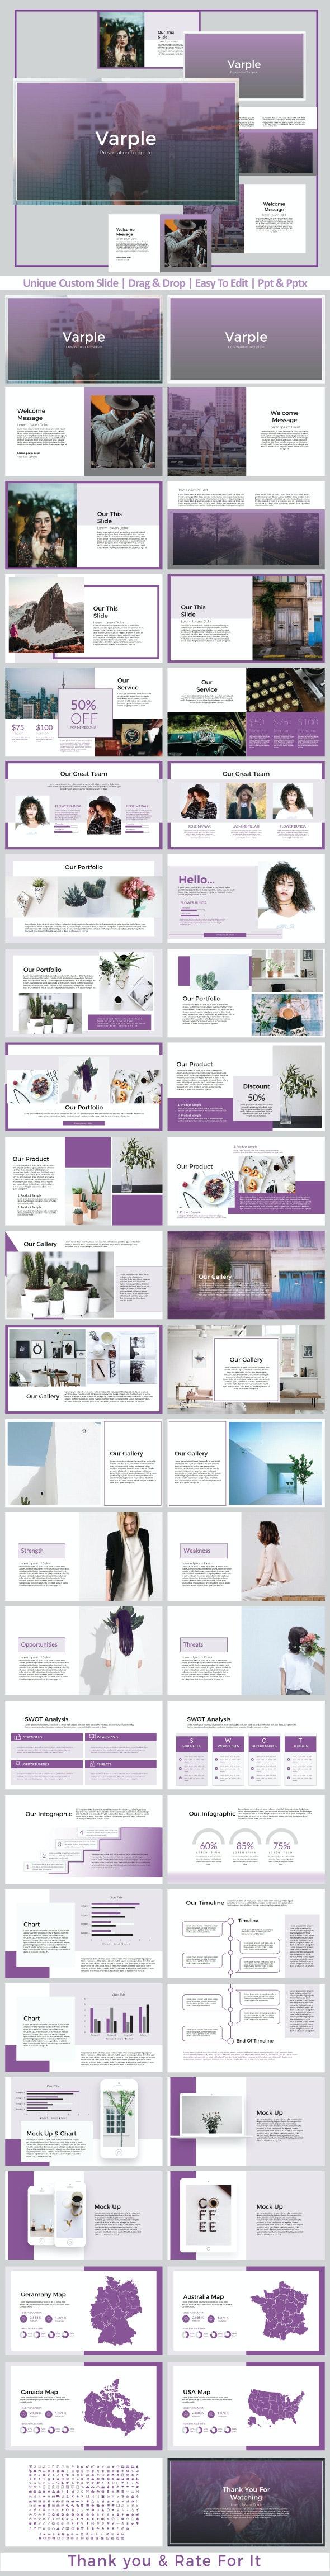 Varple Presentation Templates - Creative PowerPoint Templates